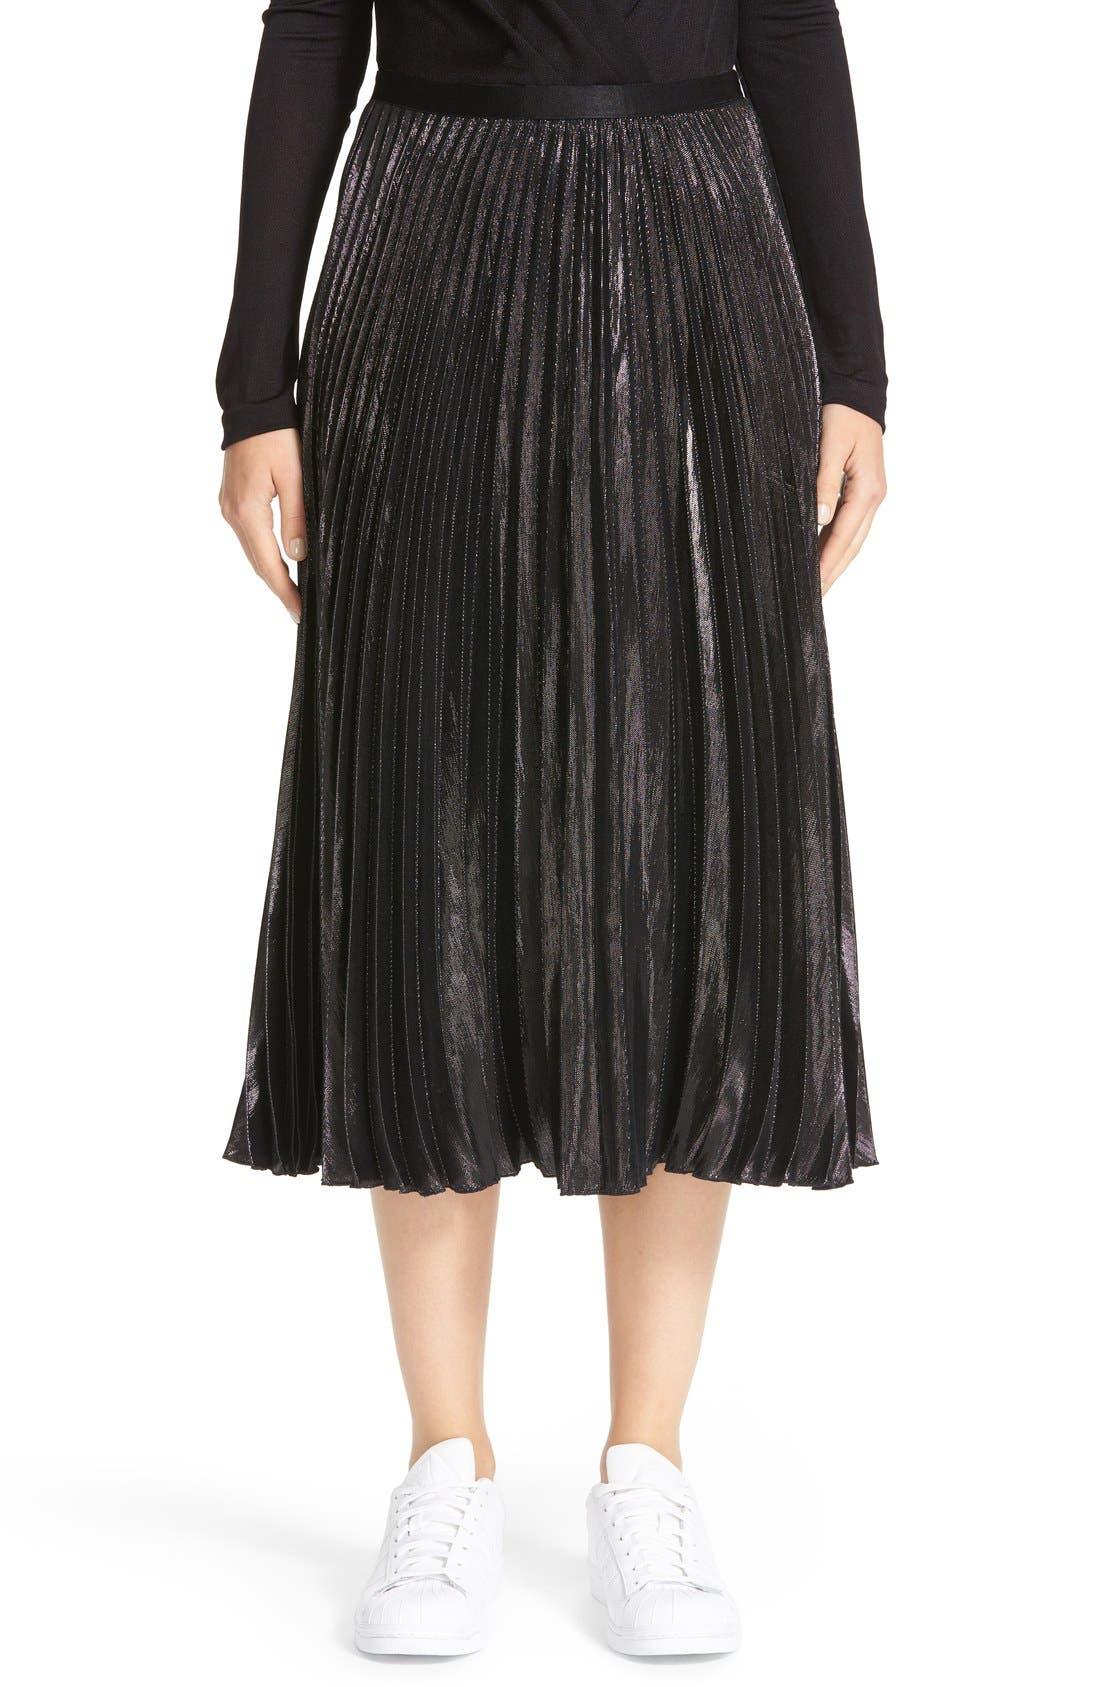 Alternate Image 1 Selected - Diane von Furstenberg Heavyn Metallic Pleated Midi Skirt